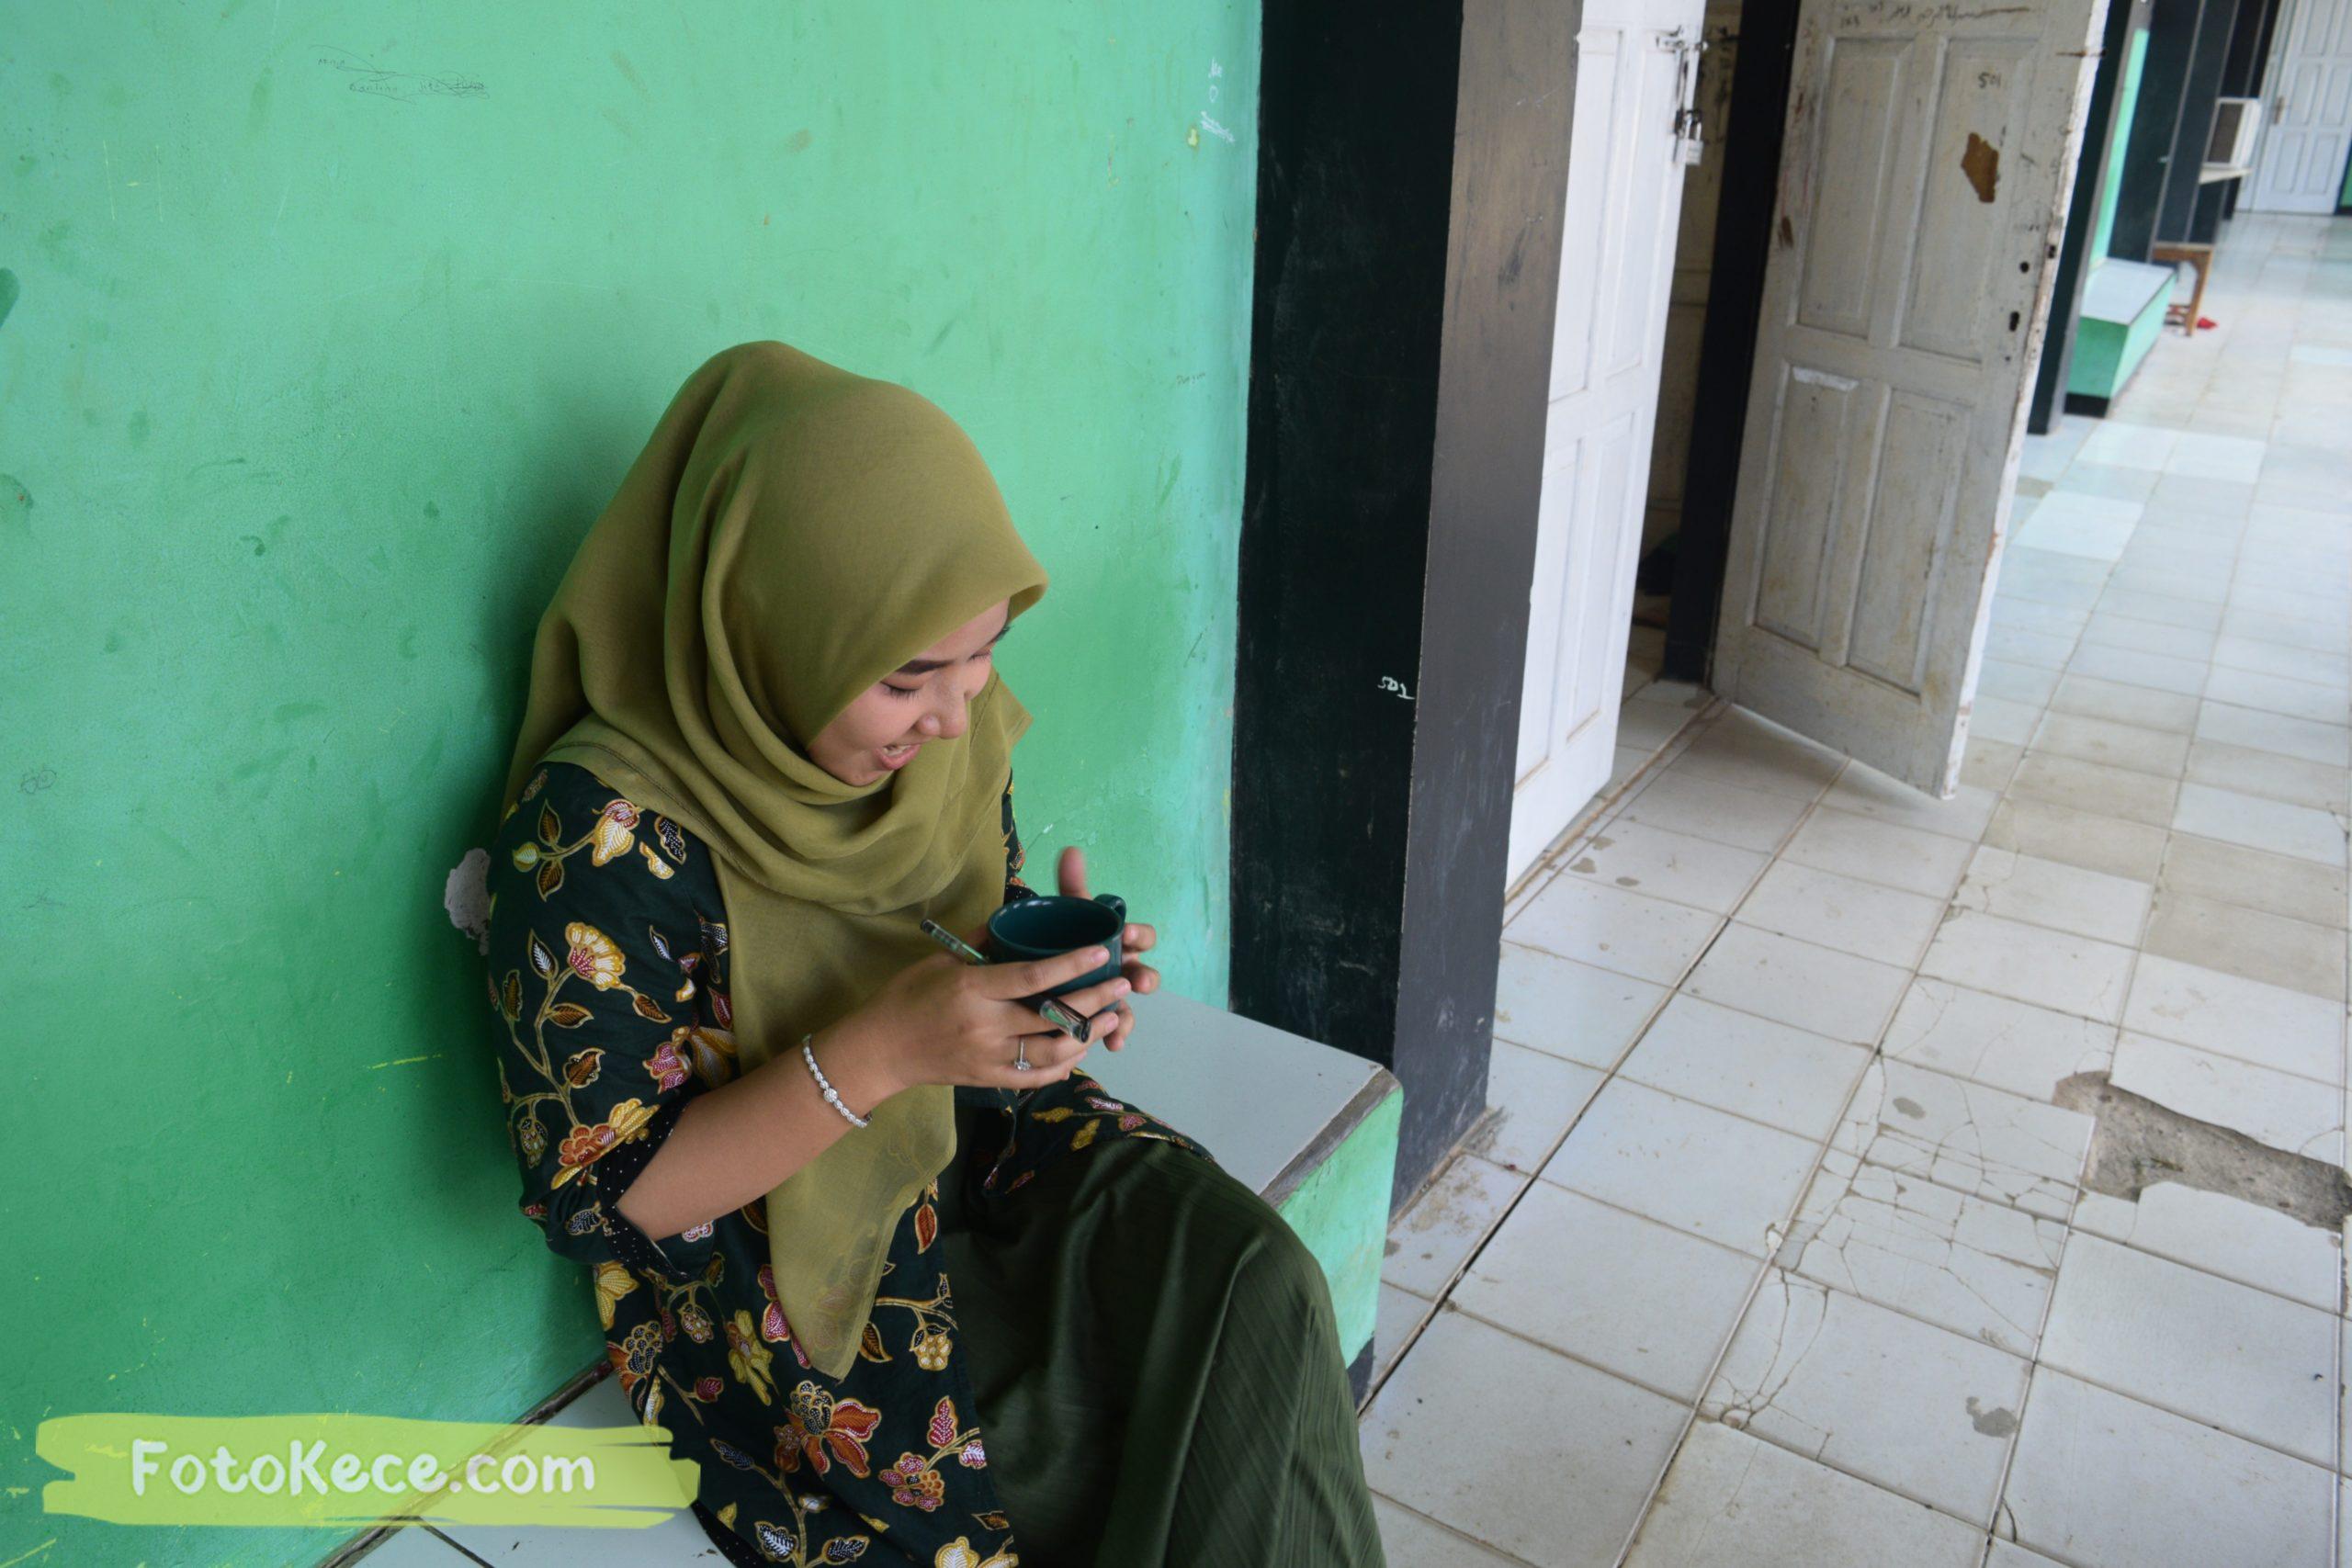 SUZANA DWI NURFAJRIEN santai pada mtsn2 smi fotokece des 2019 22 scaled